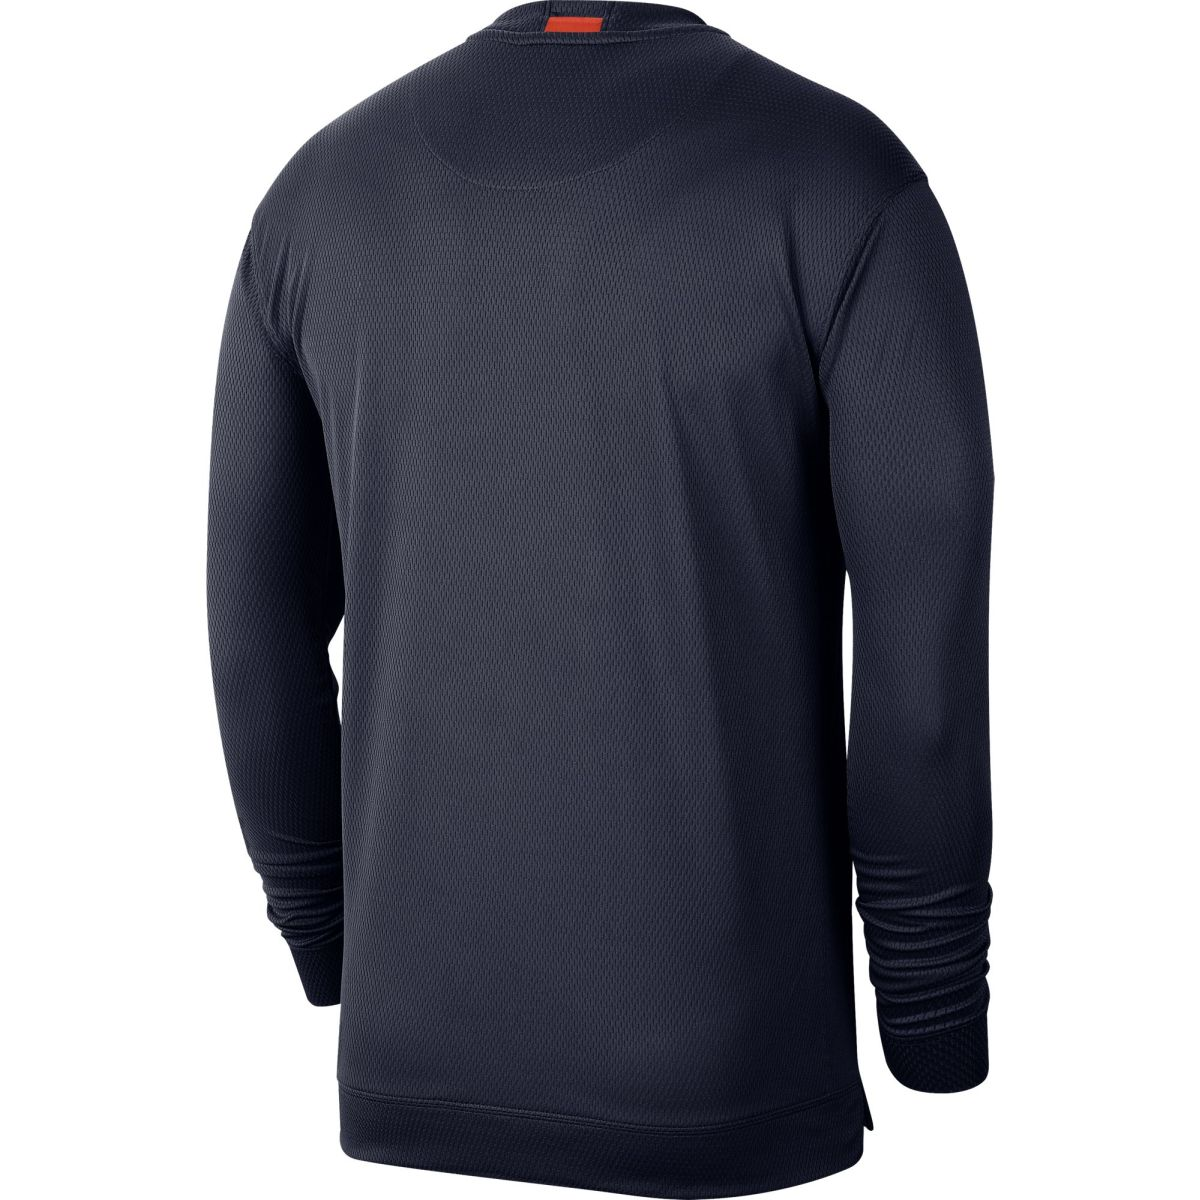 University of Virginia Dri-Fit Spotlight LS T-shirt